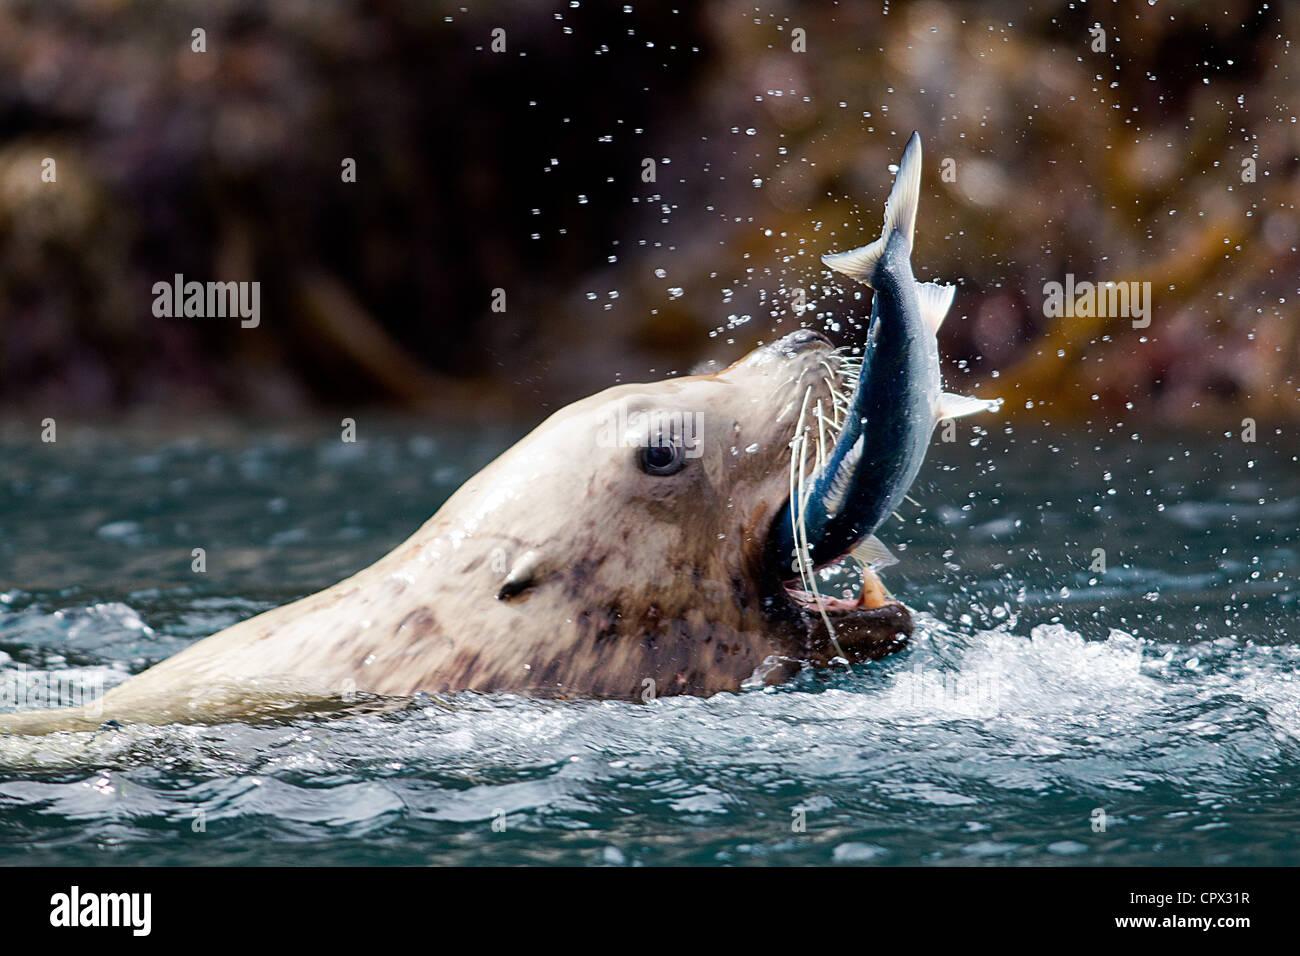 Sea Lion Stock Photos & Sea Lion Stock Images - Alamy